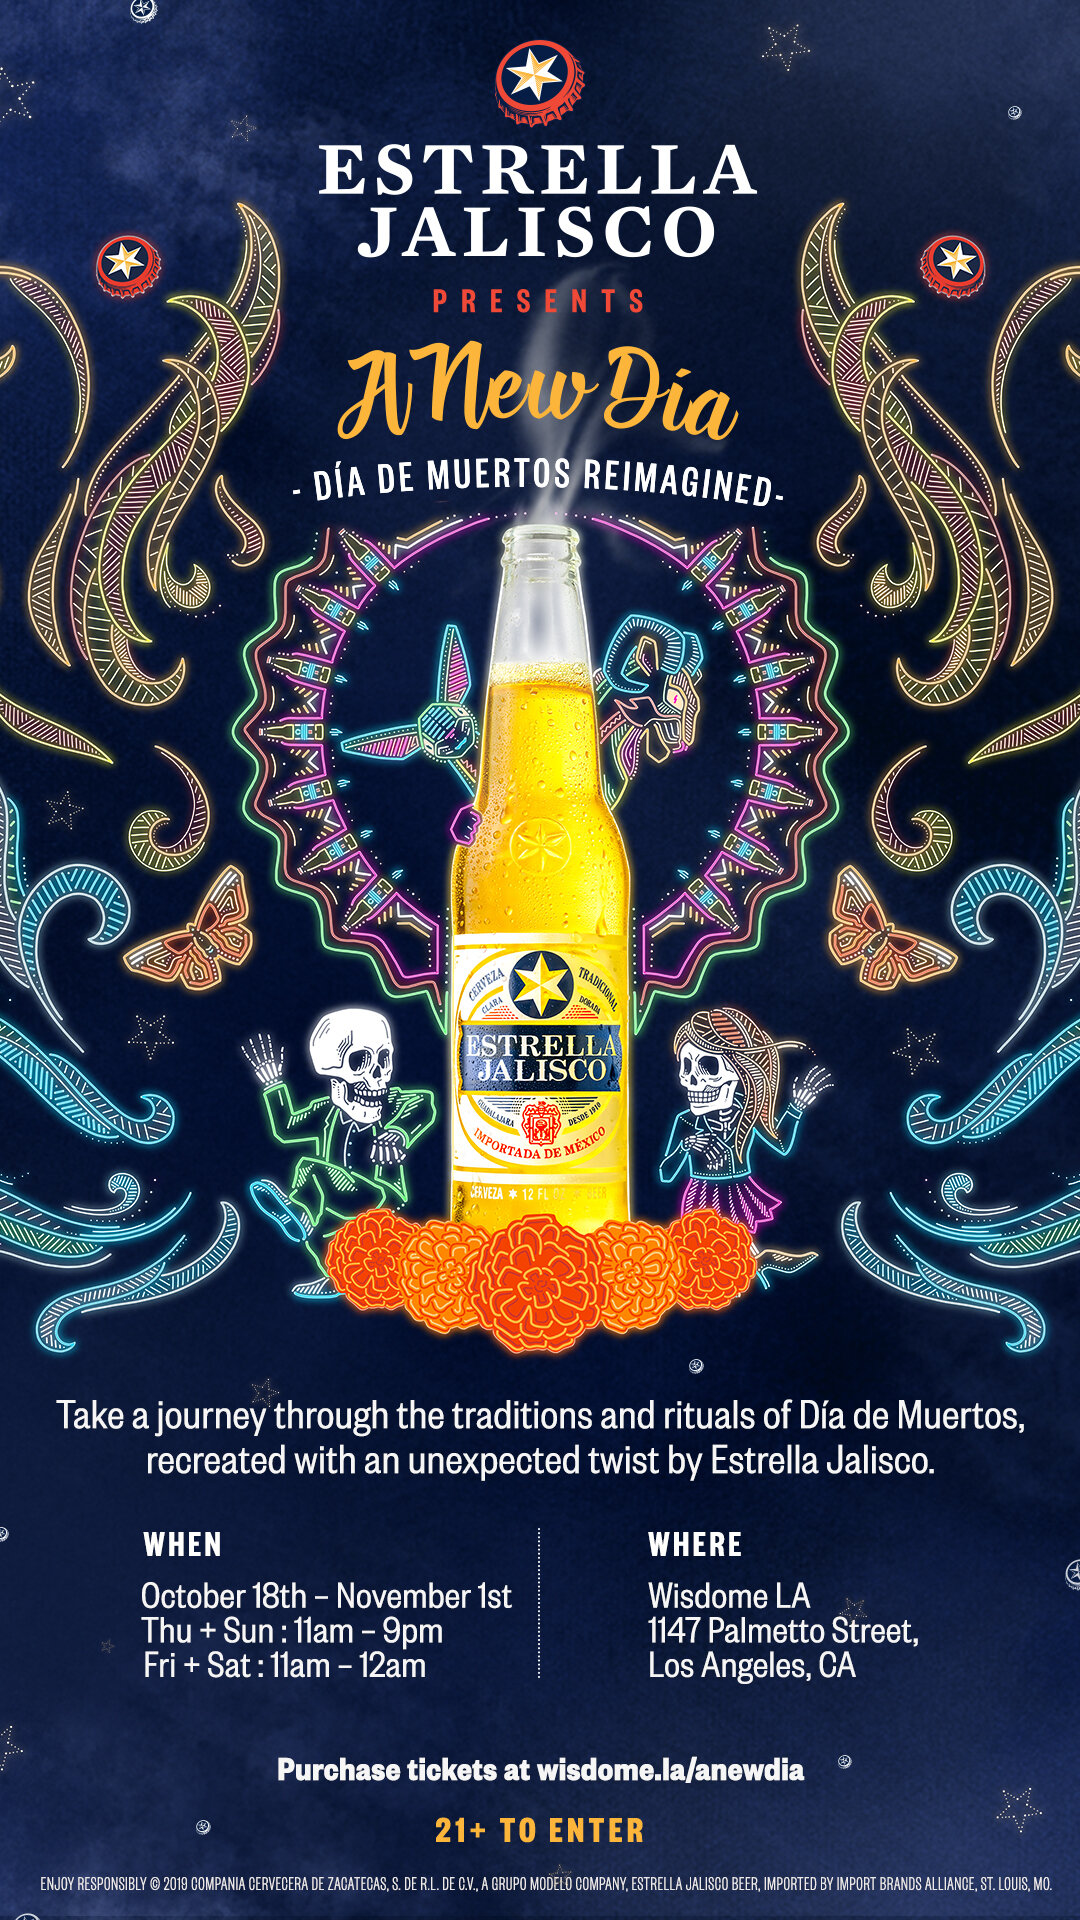 Estrella Jalisco - A New Dia Exhibit_Flyer.jpg